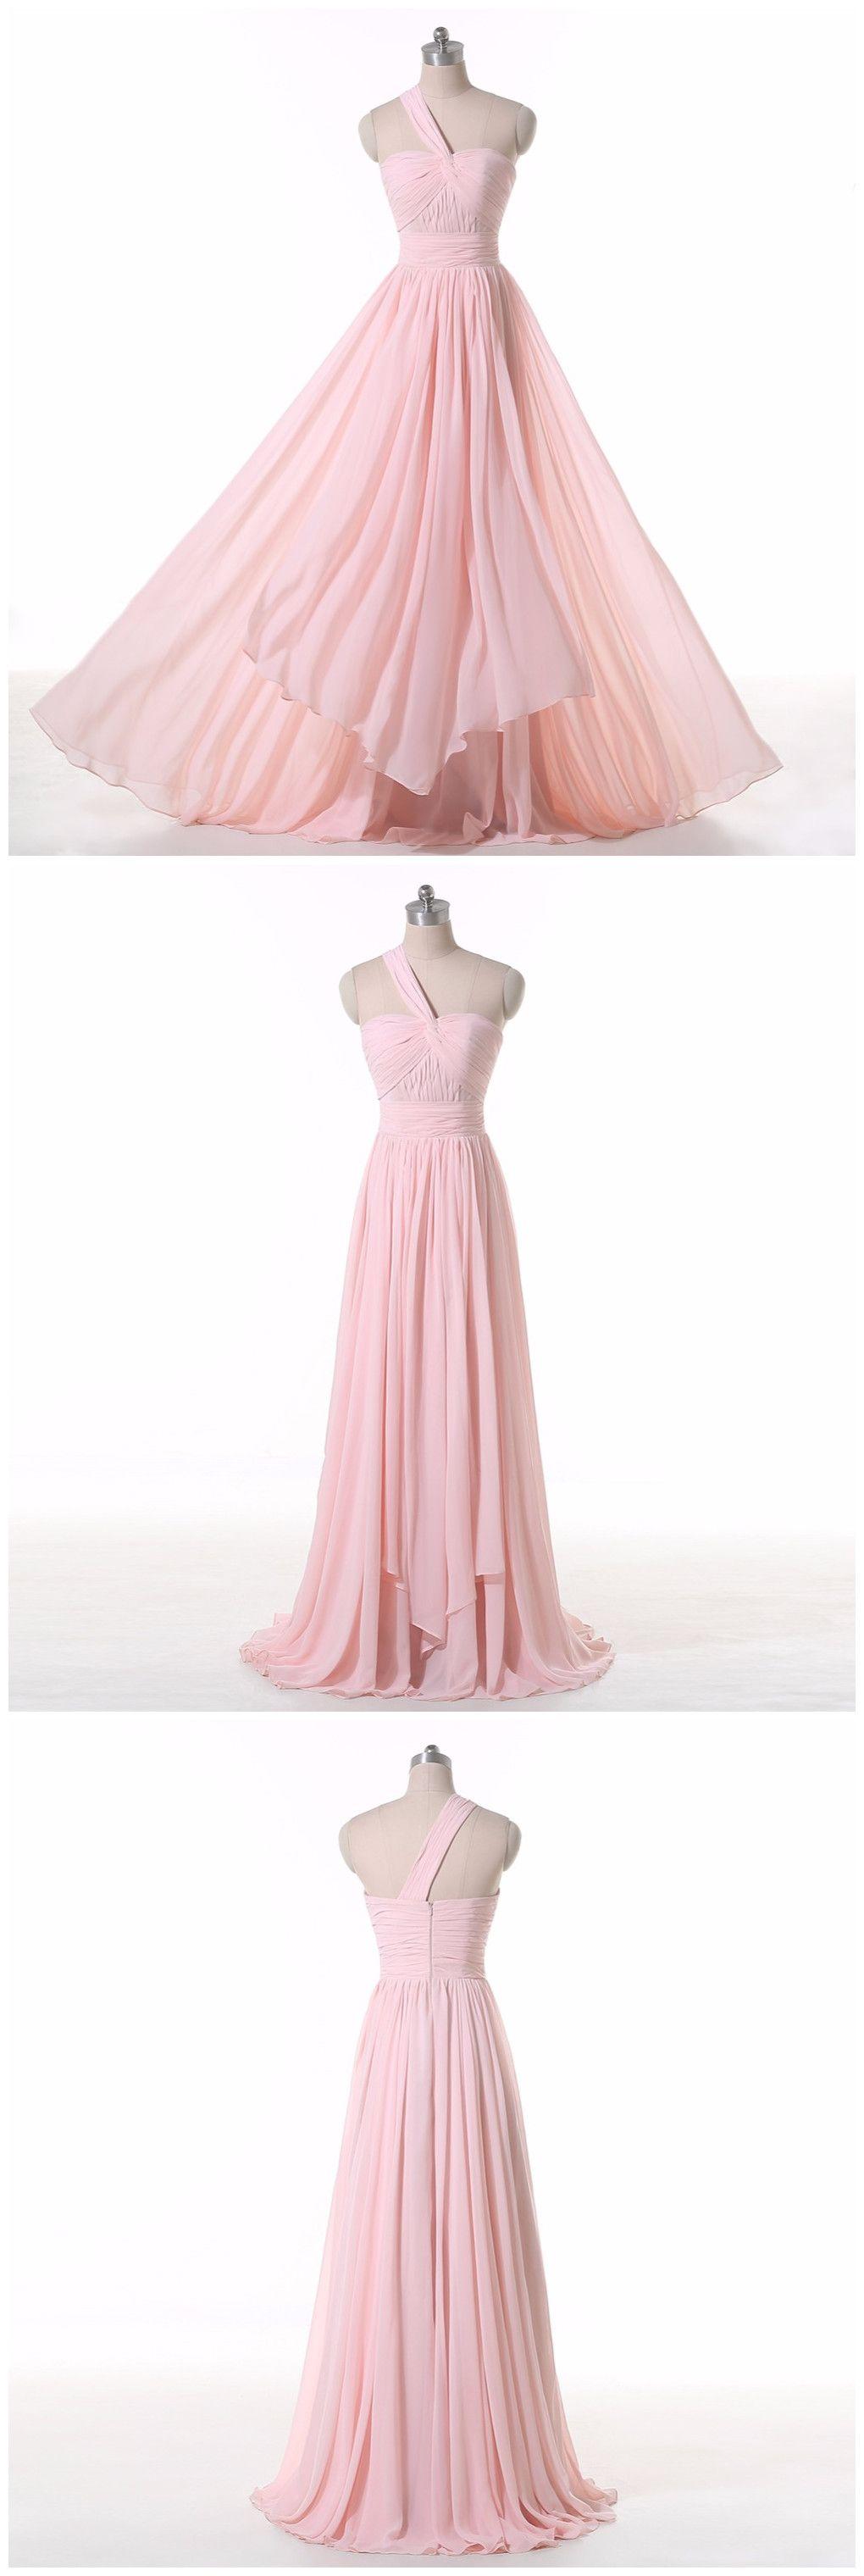 Long prom dress mermaid evening dressmuestra verdadera dresses